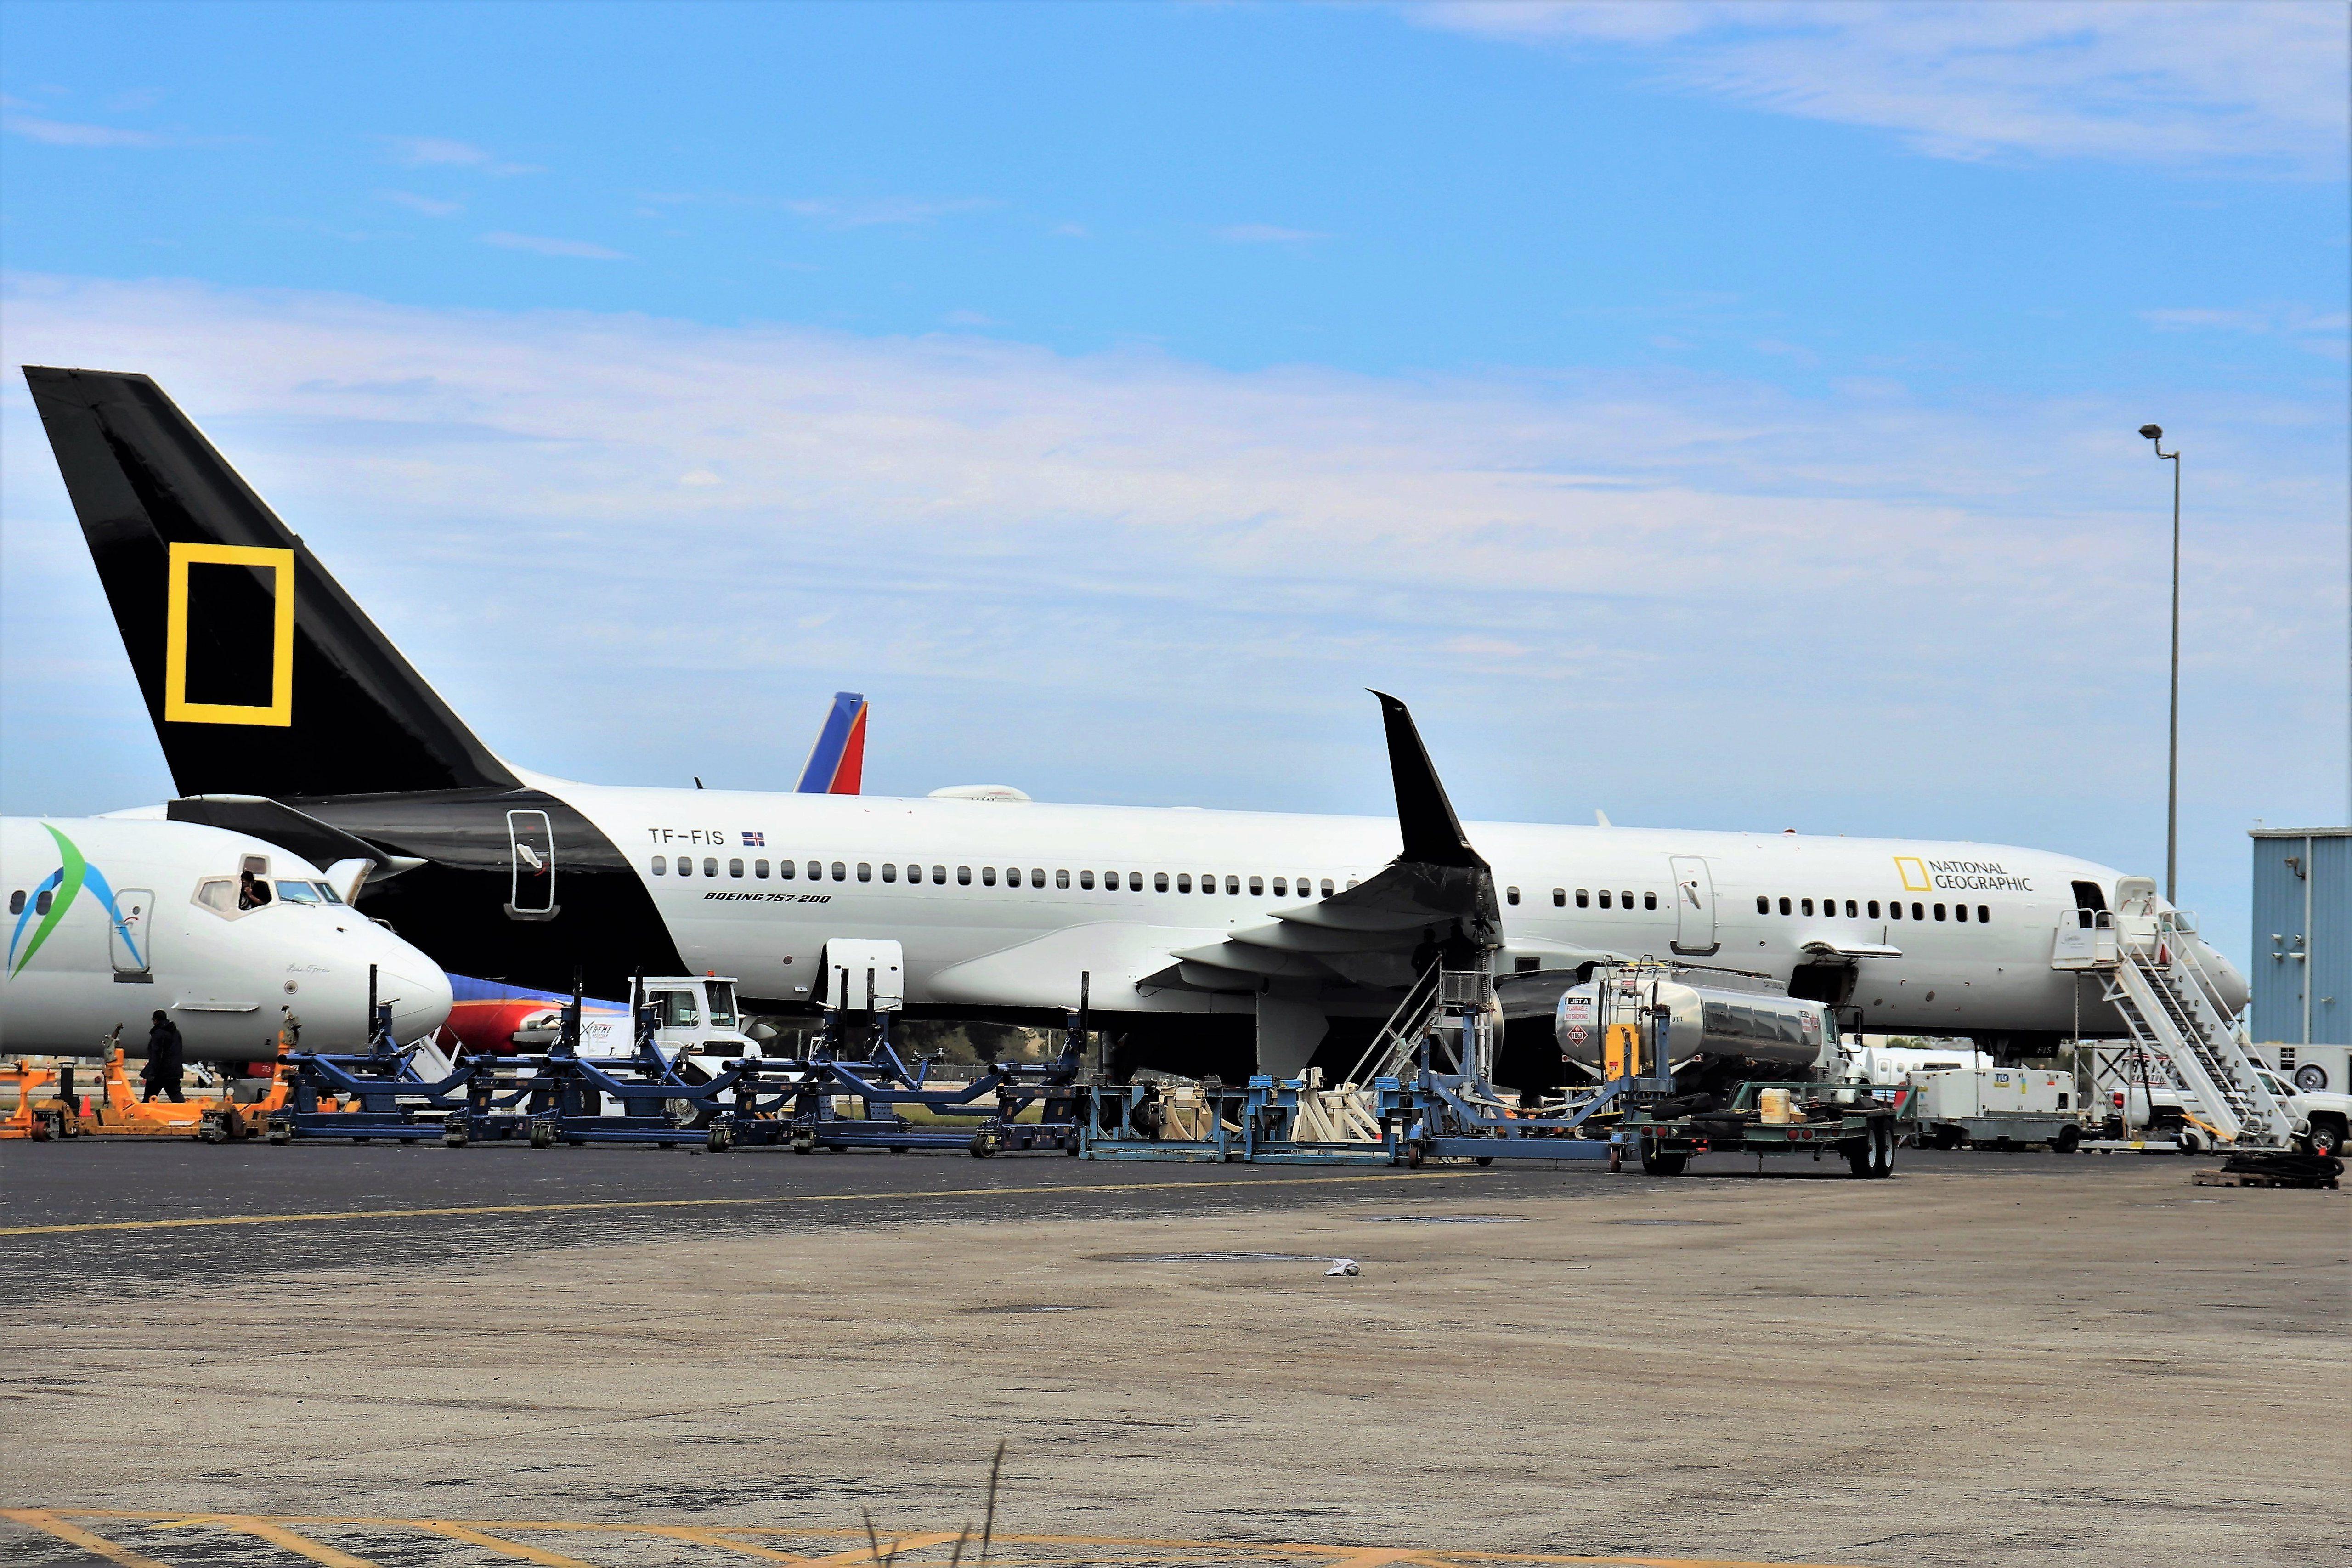 Icelandair 757 National Geographic National Iberia